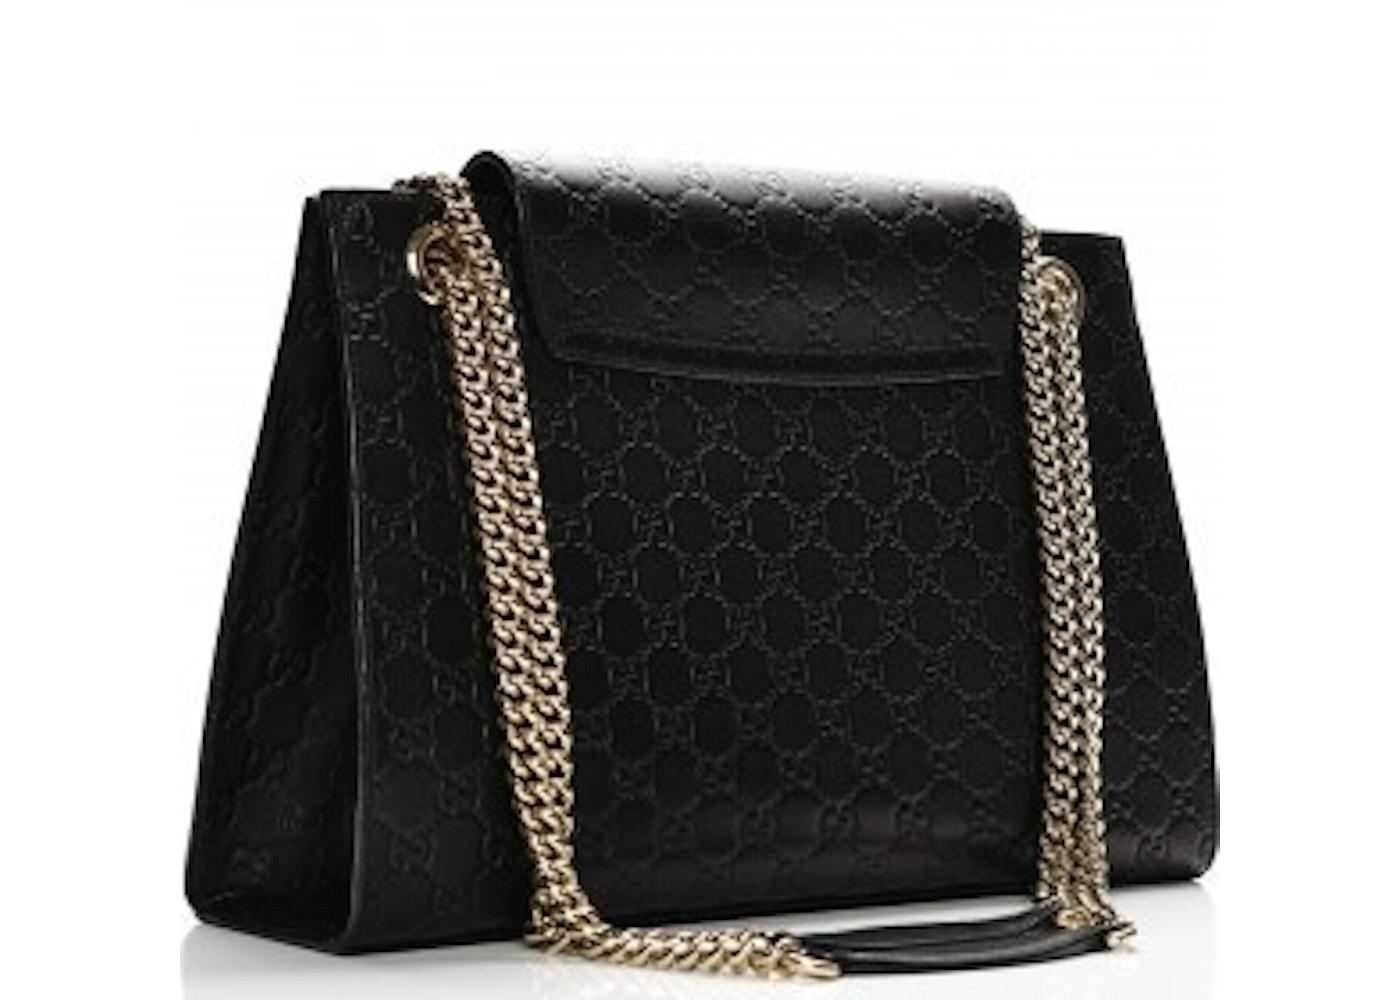 e7975d3001b Gucci Emily Chain Shoulder Bag Guccissima Large Black